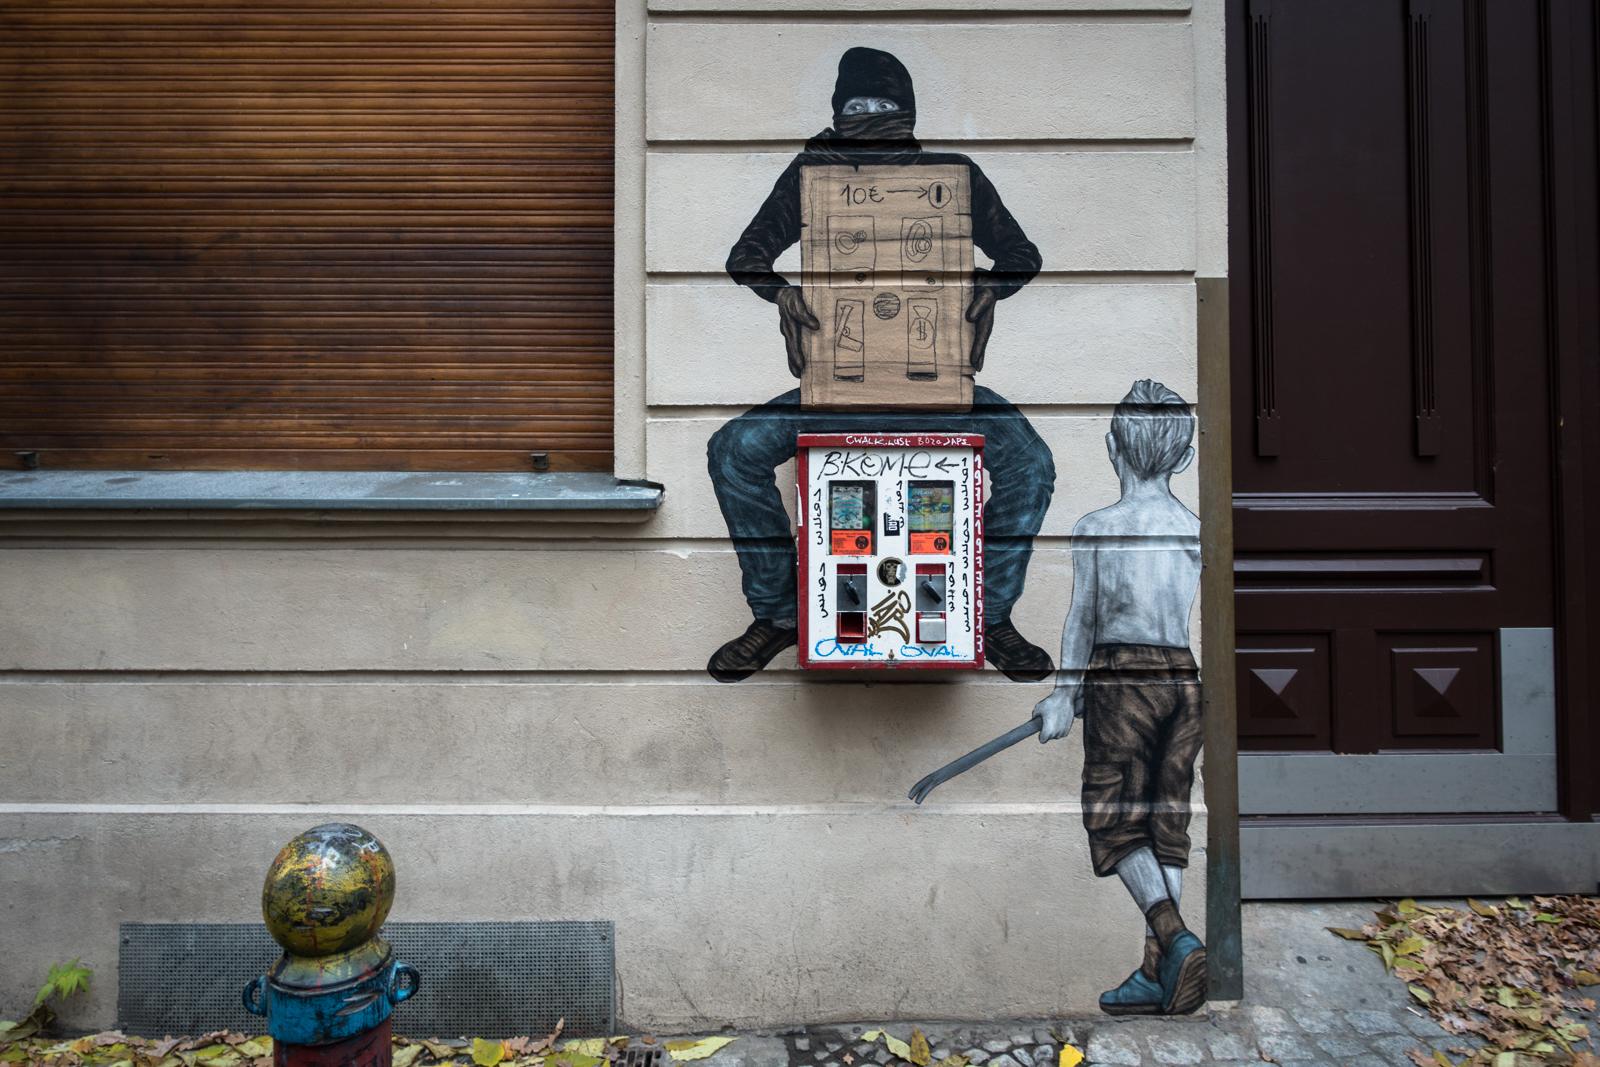 levalets paste ups – bergstrasse, berlin | URBANPRESENTS